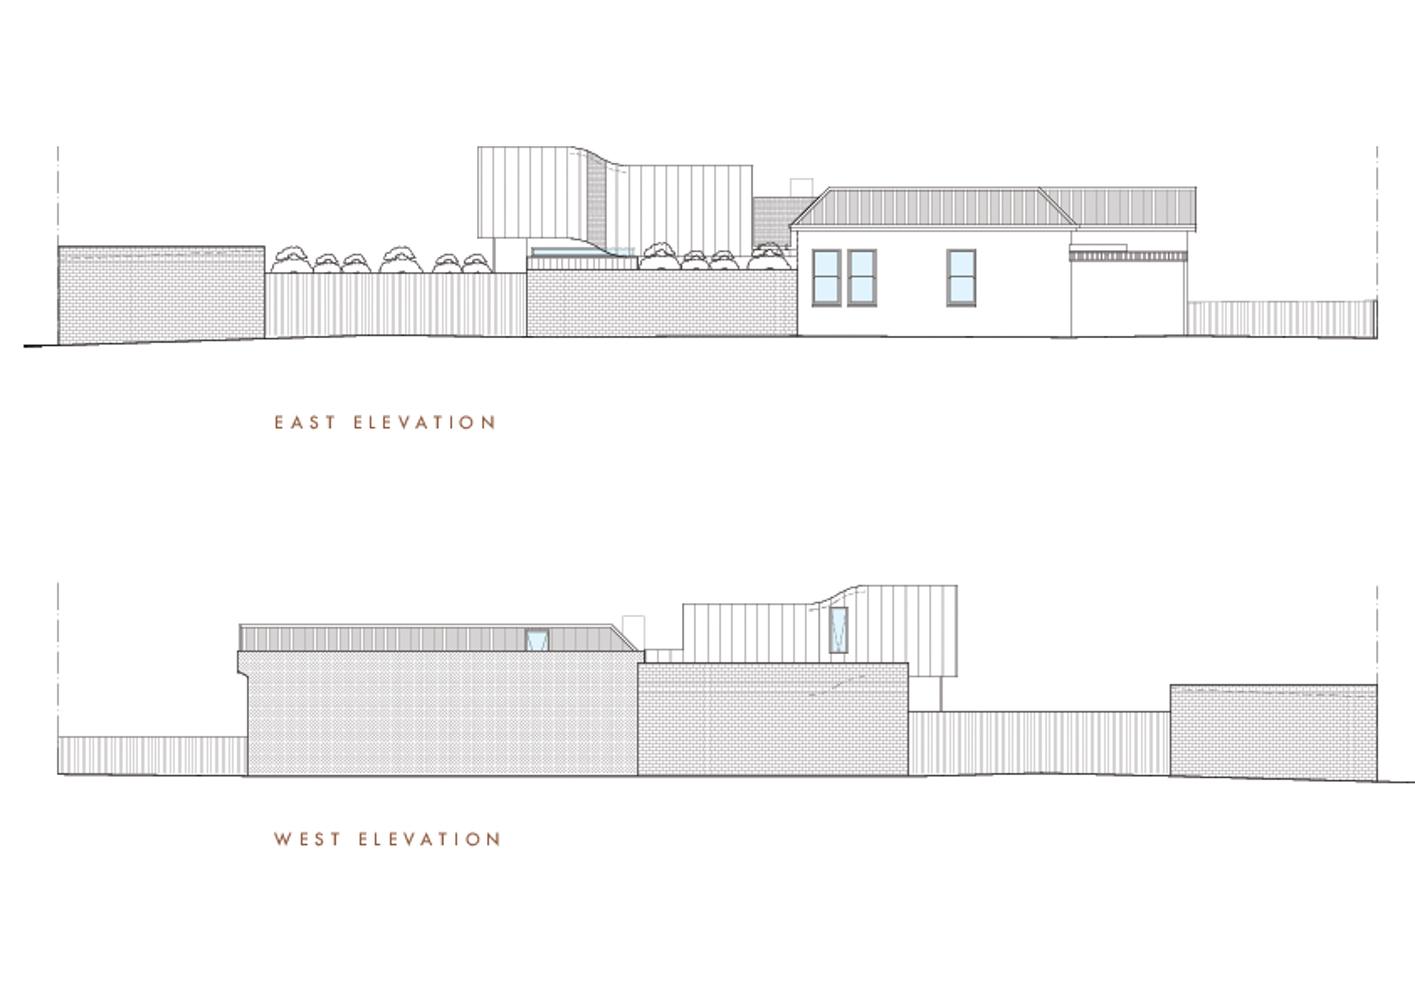 perched-house-rara-architect-the-design-emotive-19.jpg